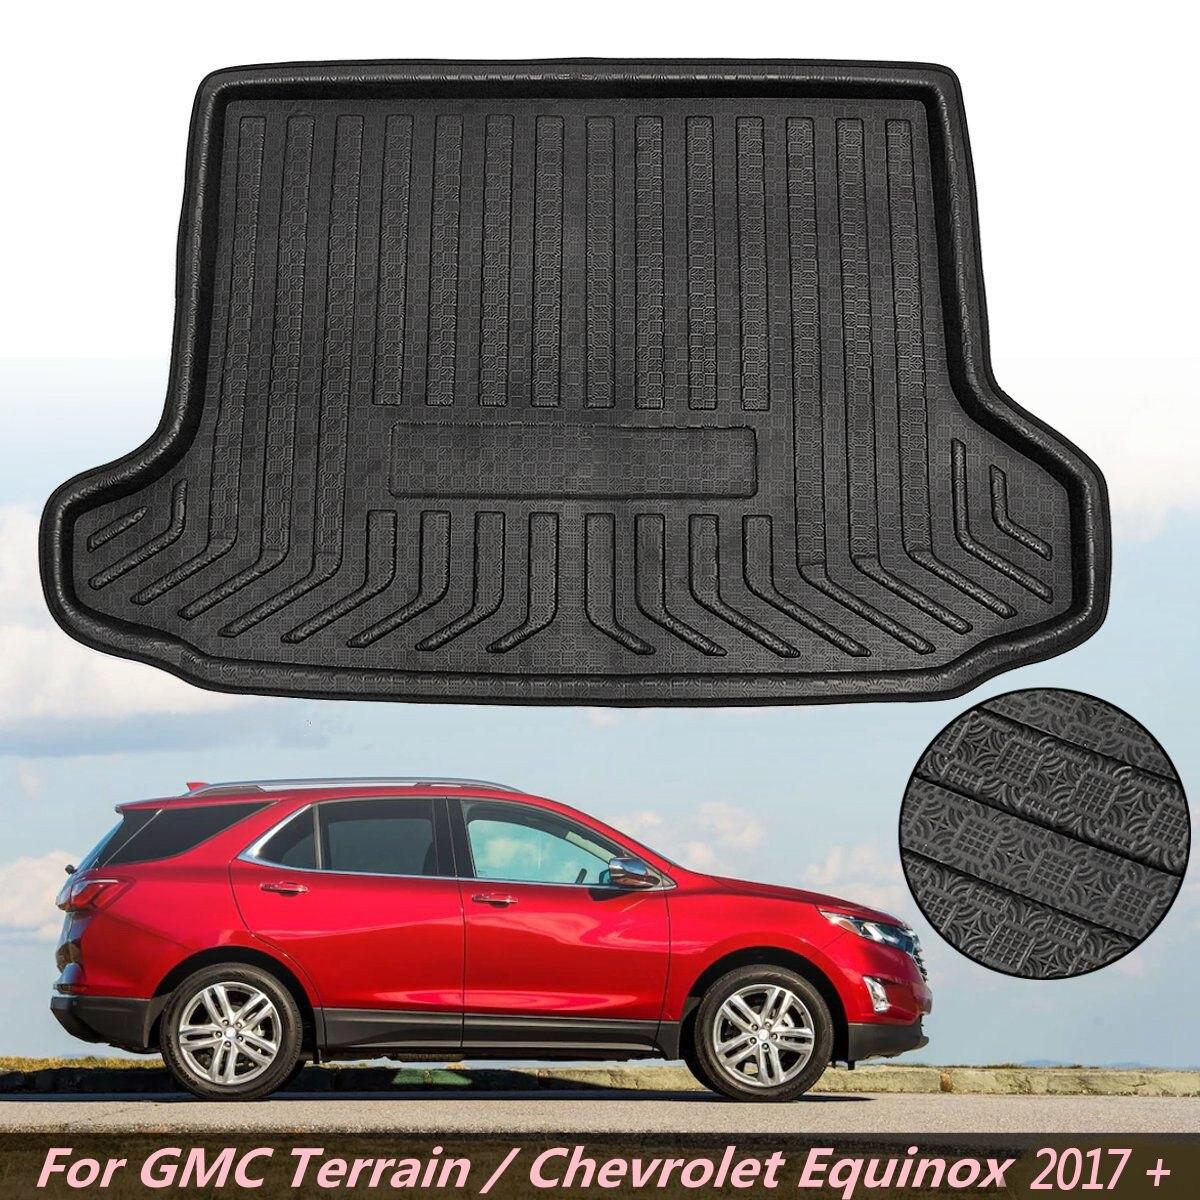 Cargo Liner Rear Trunk Mat For GMC Terrain For Chevrolet Equinox 2017 Up Floor Tray Carpet Mud Pad Kick Guard Anti Slip Mat